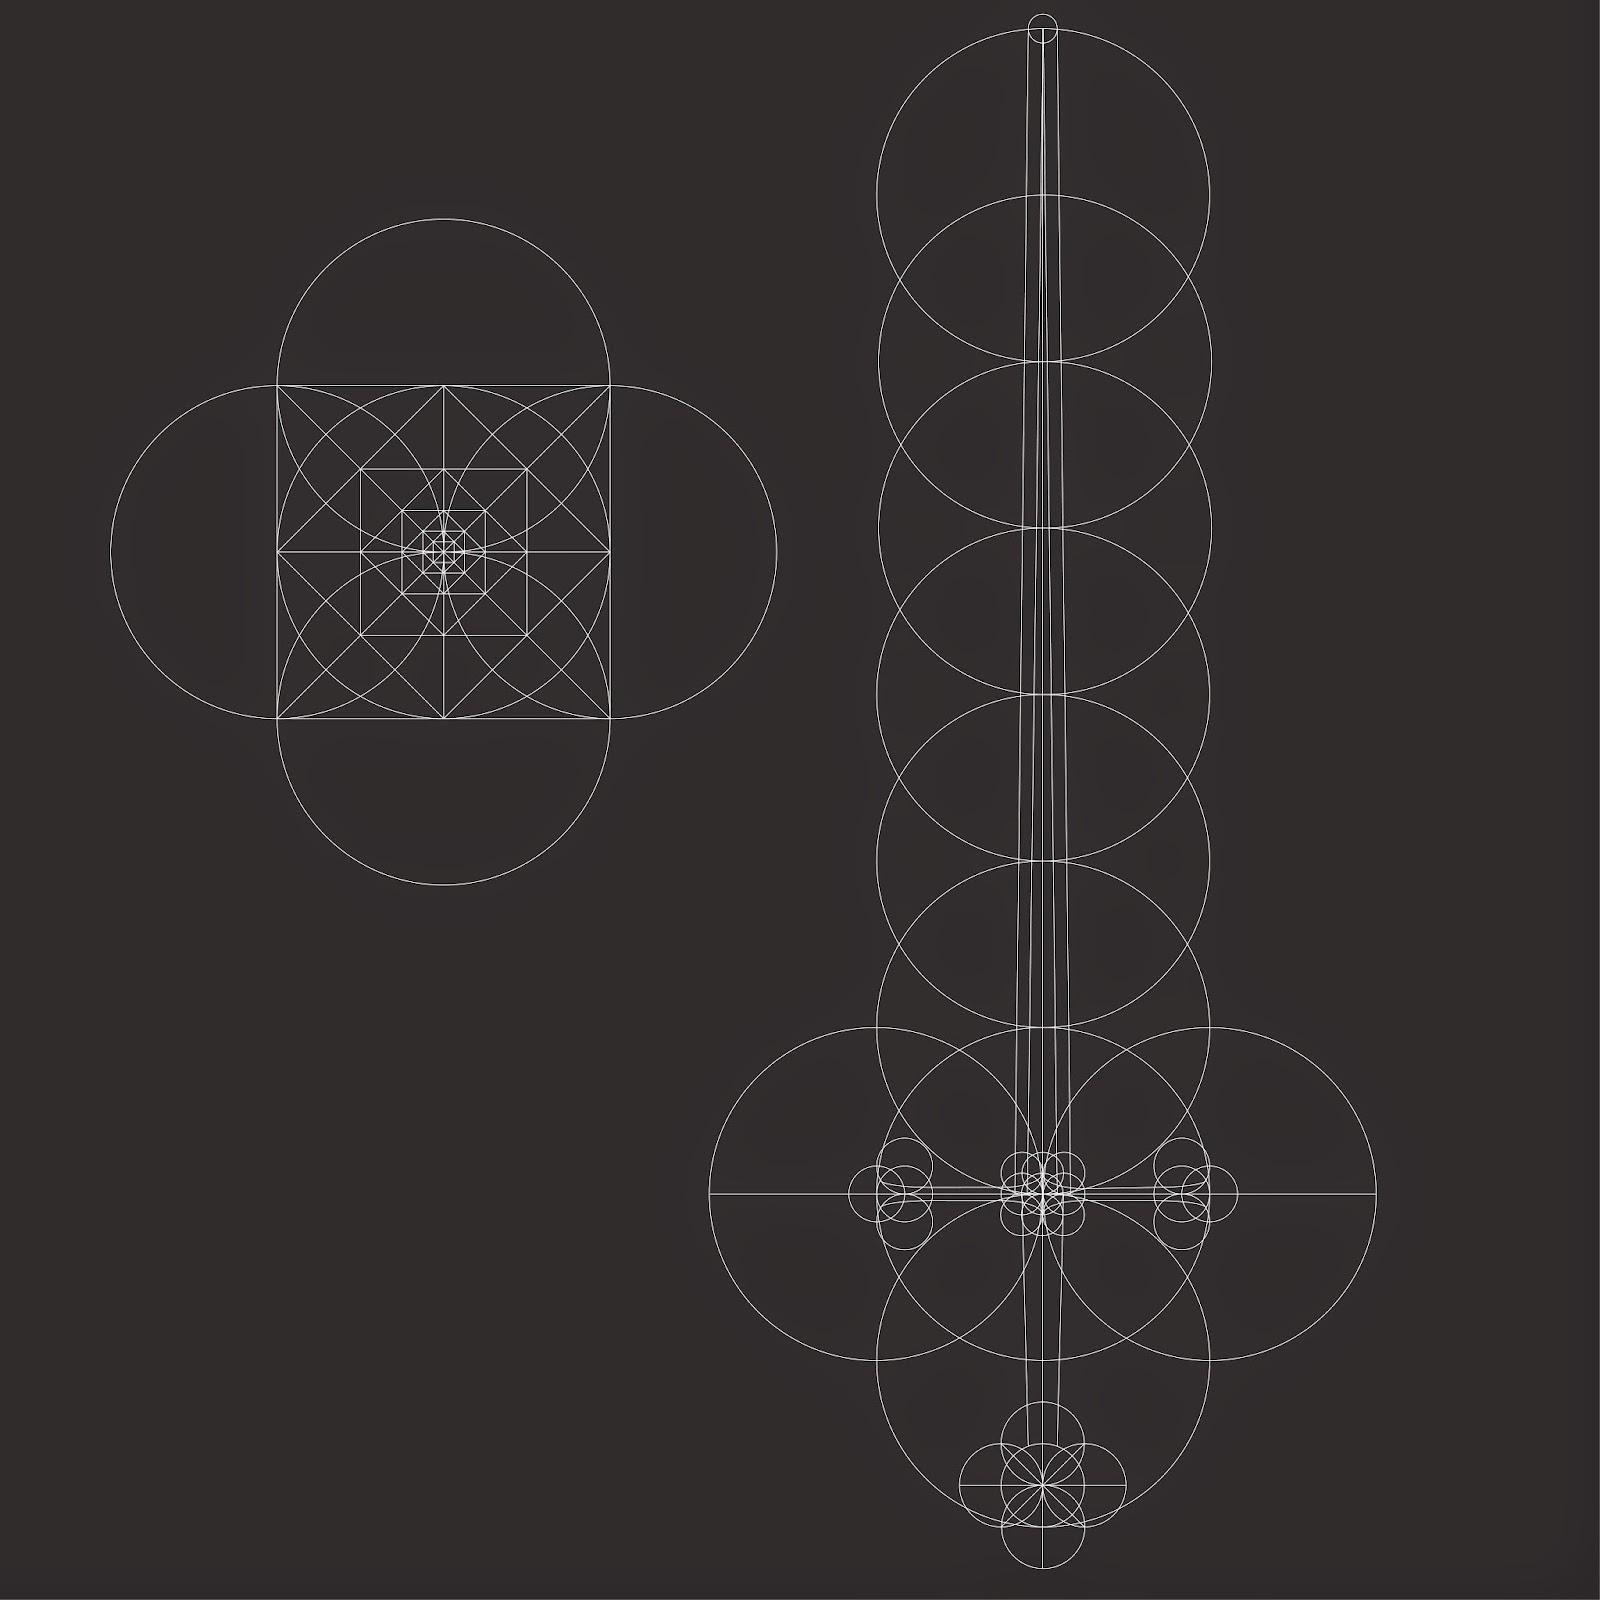 cover+geometry.jpg